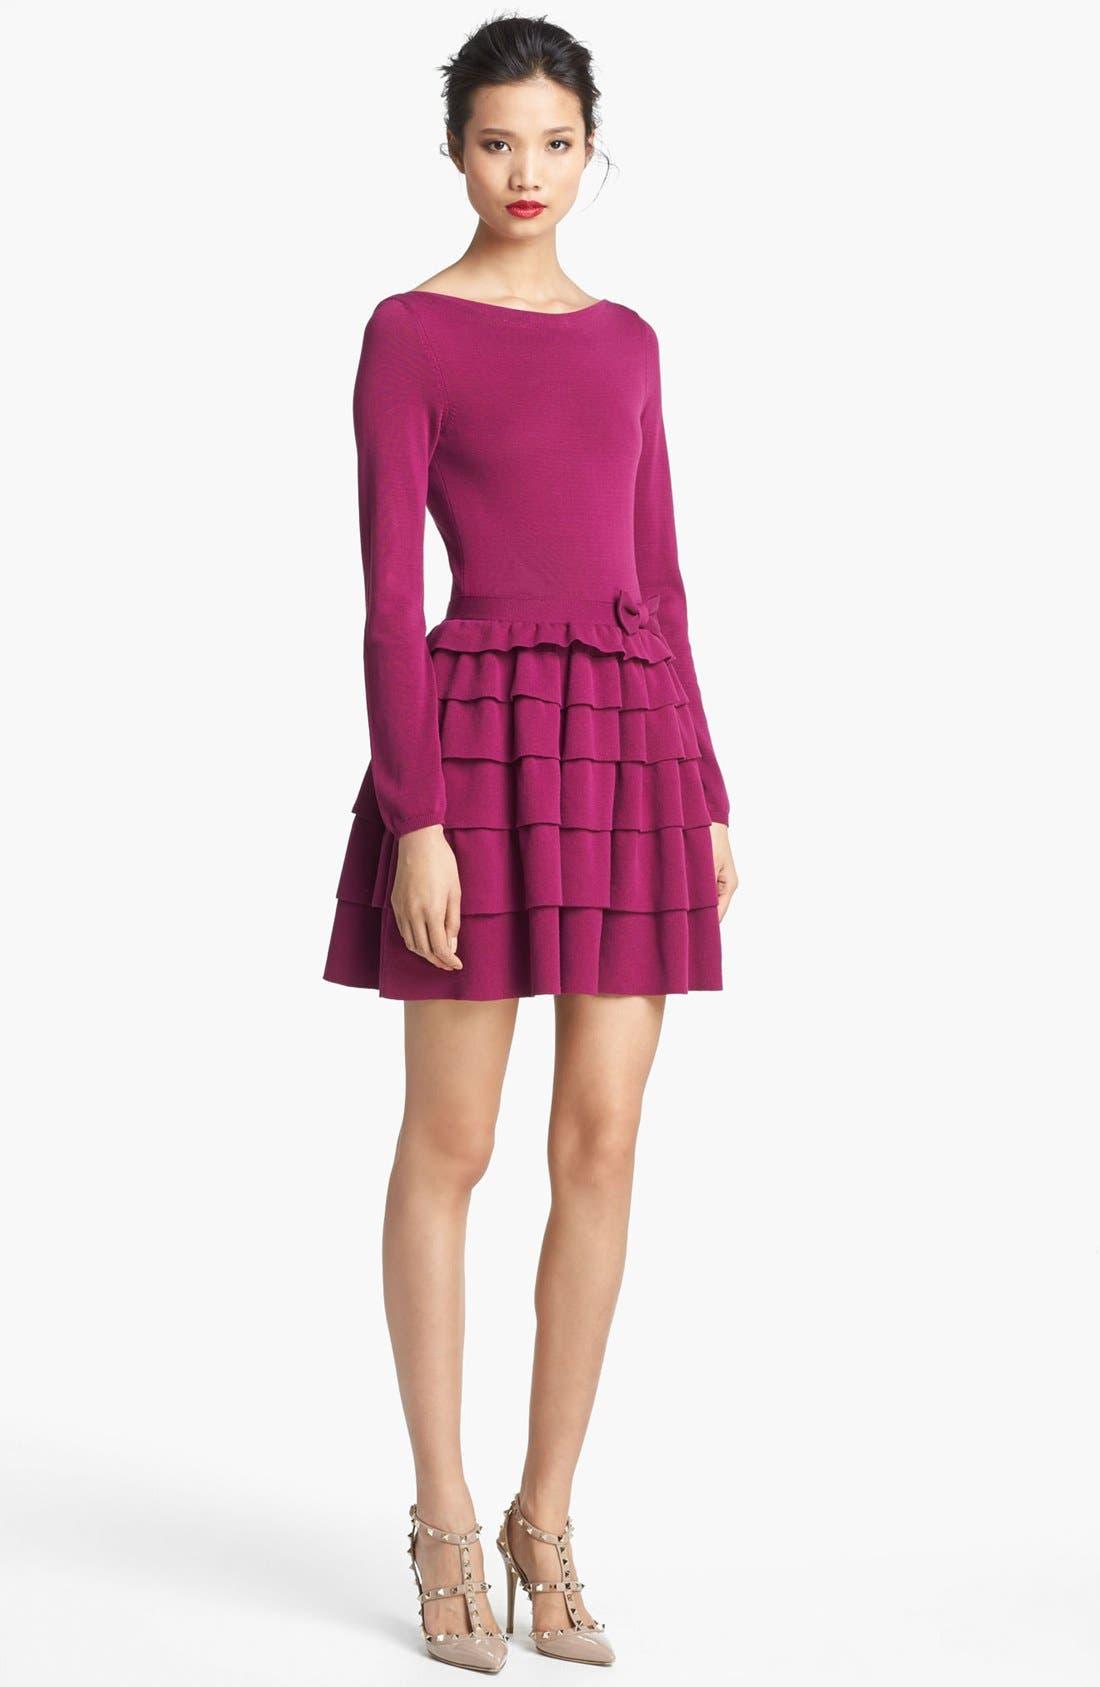 Alternate Image 1 Selected - RED Valentino Ruffle Skirt Dress